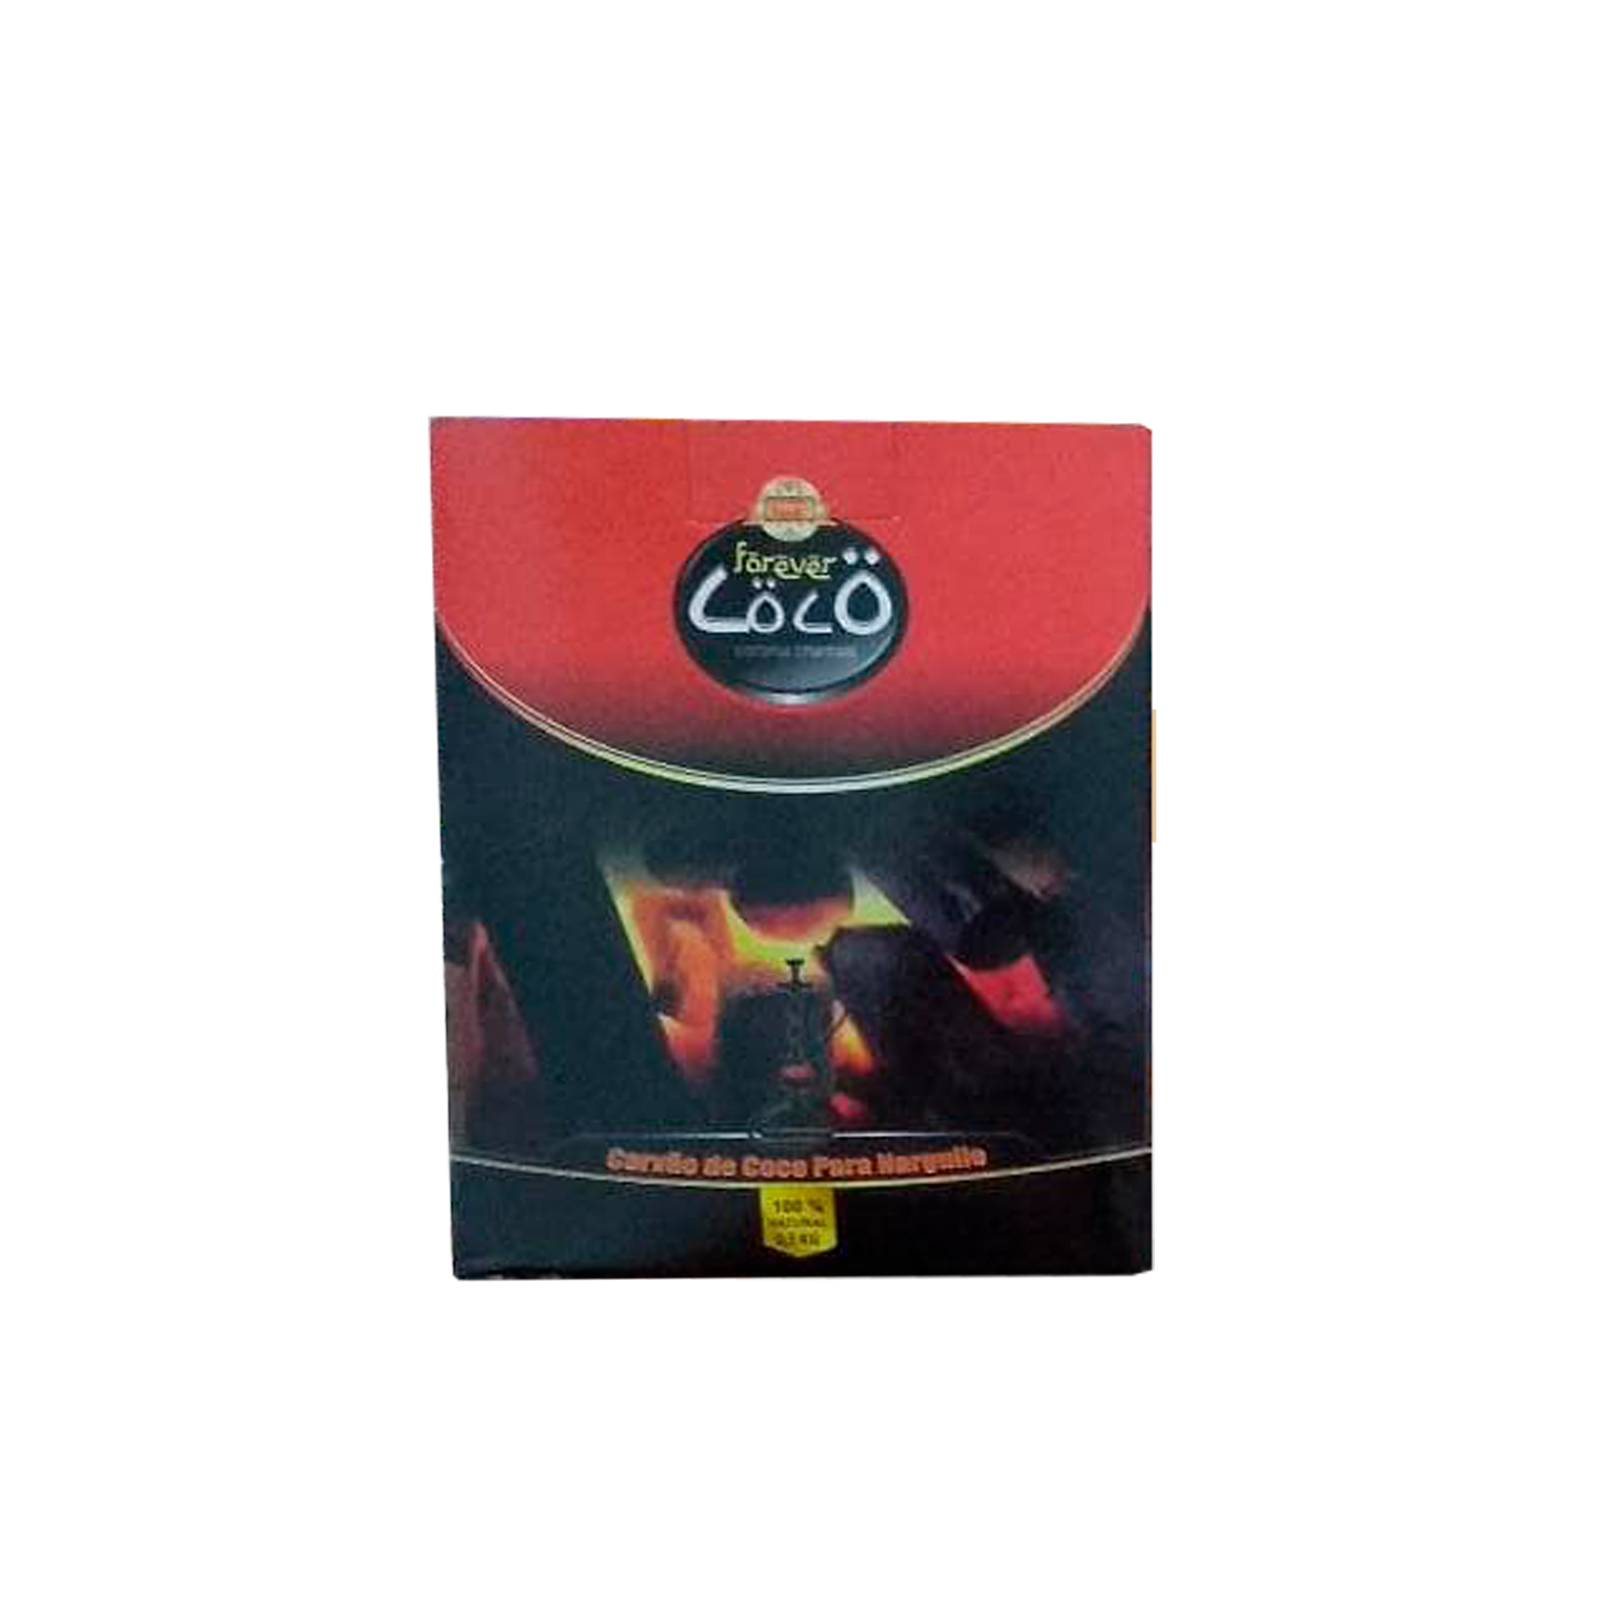 Carvao de Narguile - Forever Coco 500g